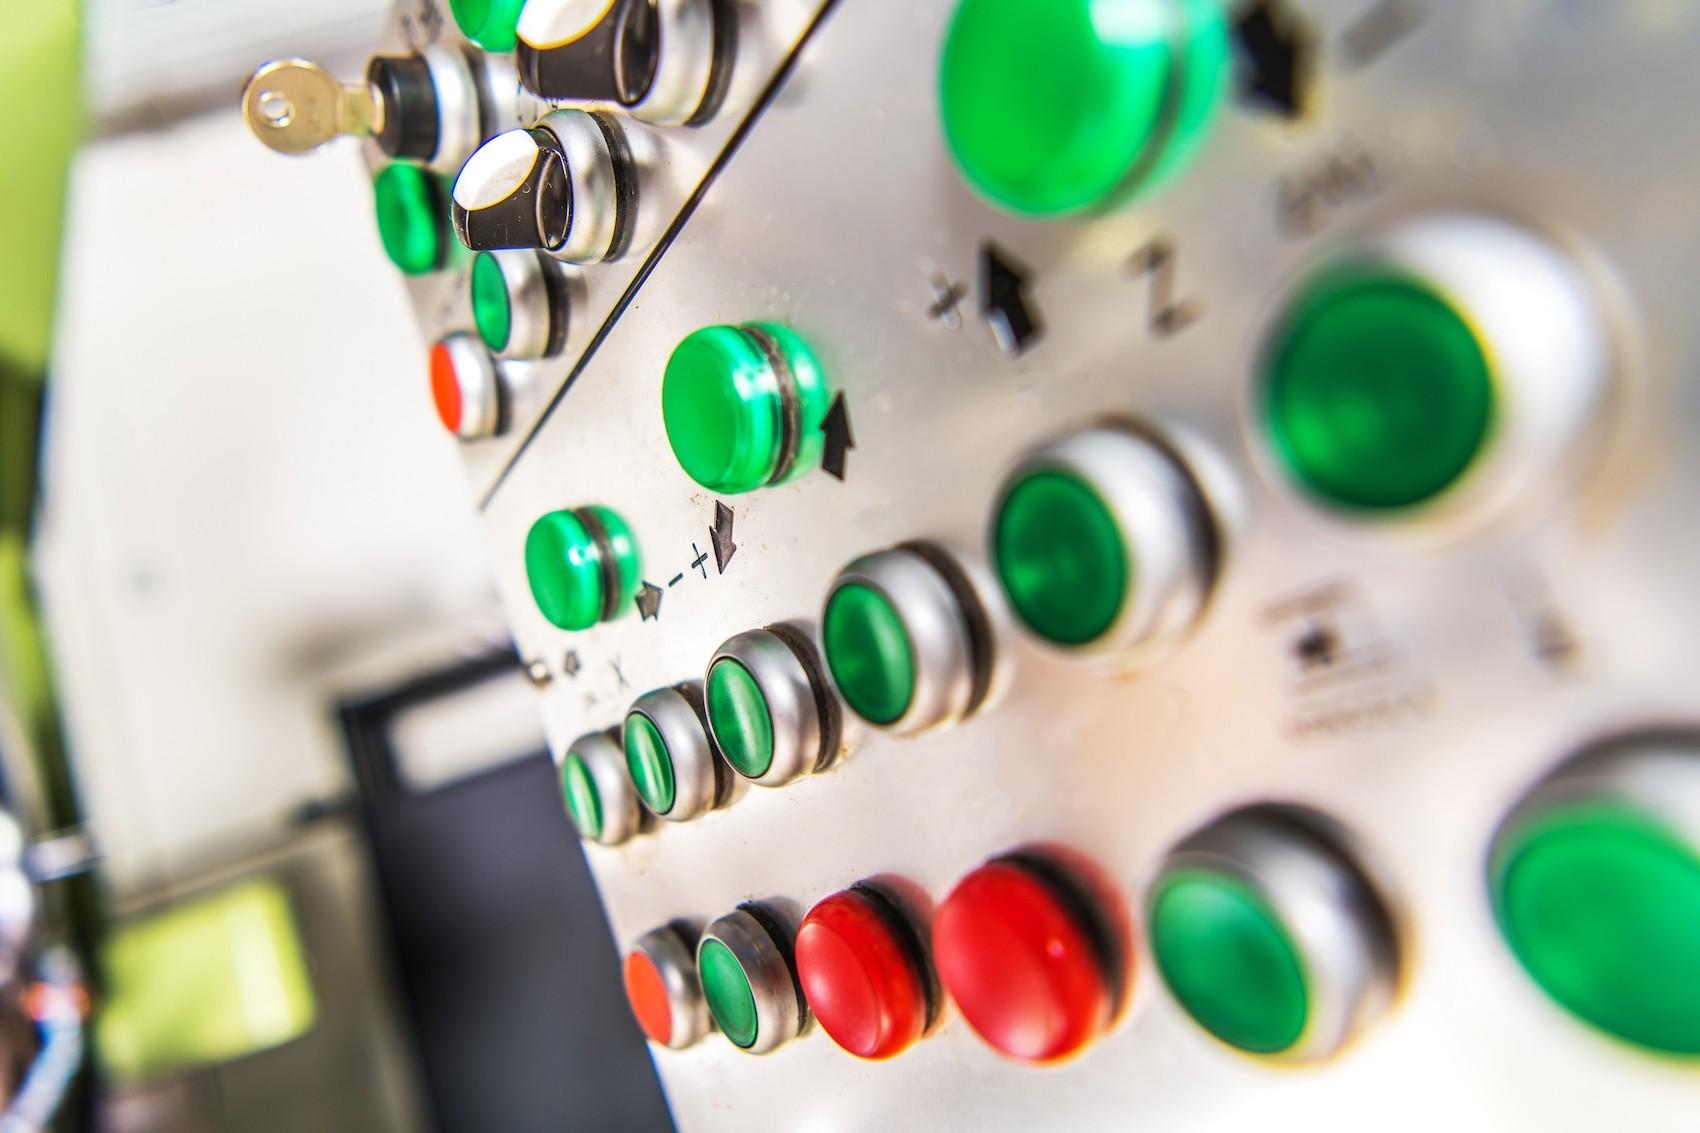 TechNative | Cybersecurity: Industrial progress needs industrial protection